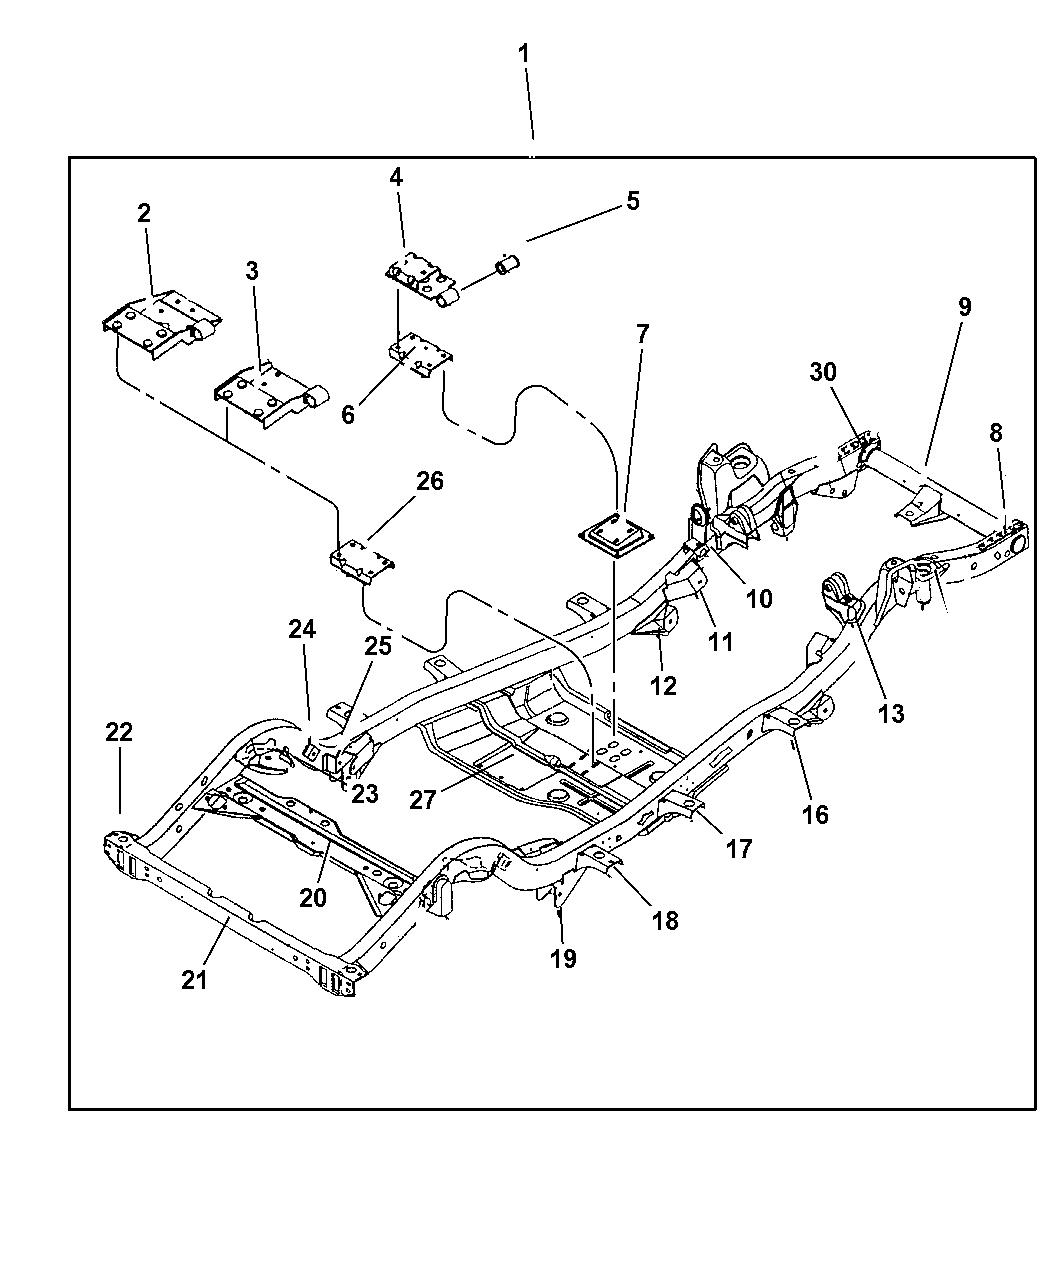 2004 Jeep Wrangler Frame - Mopar Parts Giant